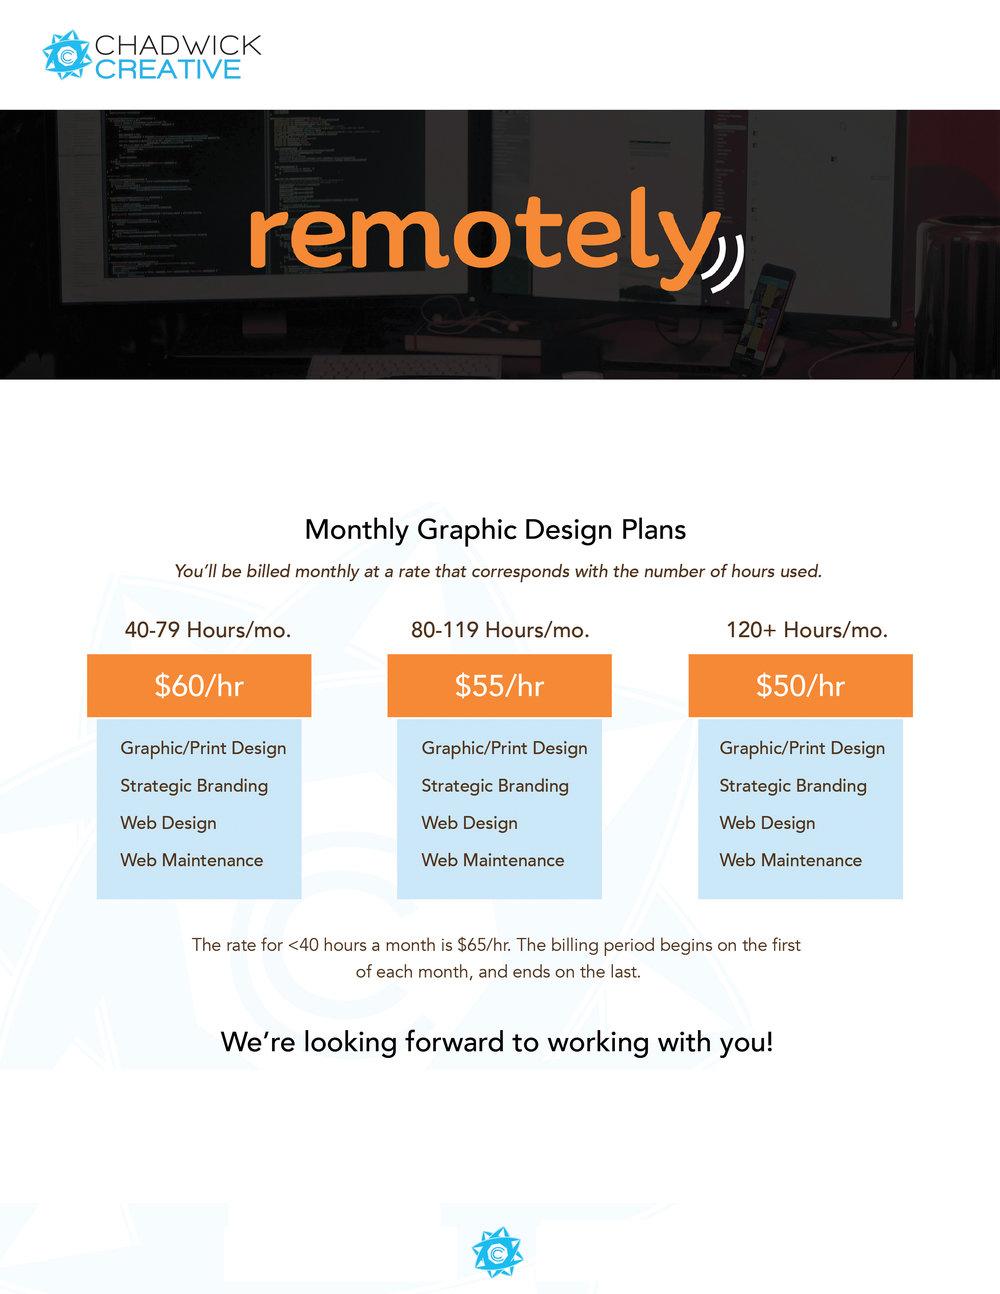 Remotely-Proposal-NYC-B.jpg